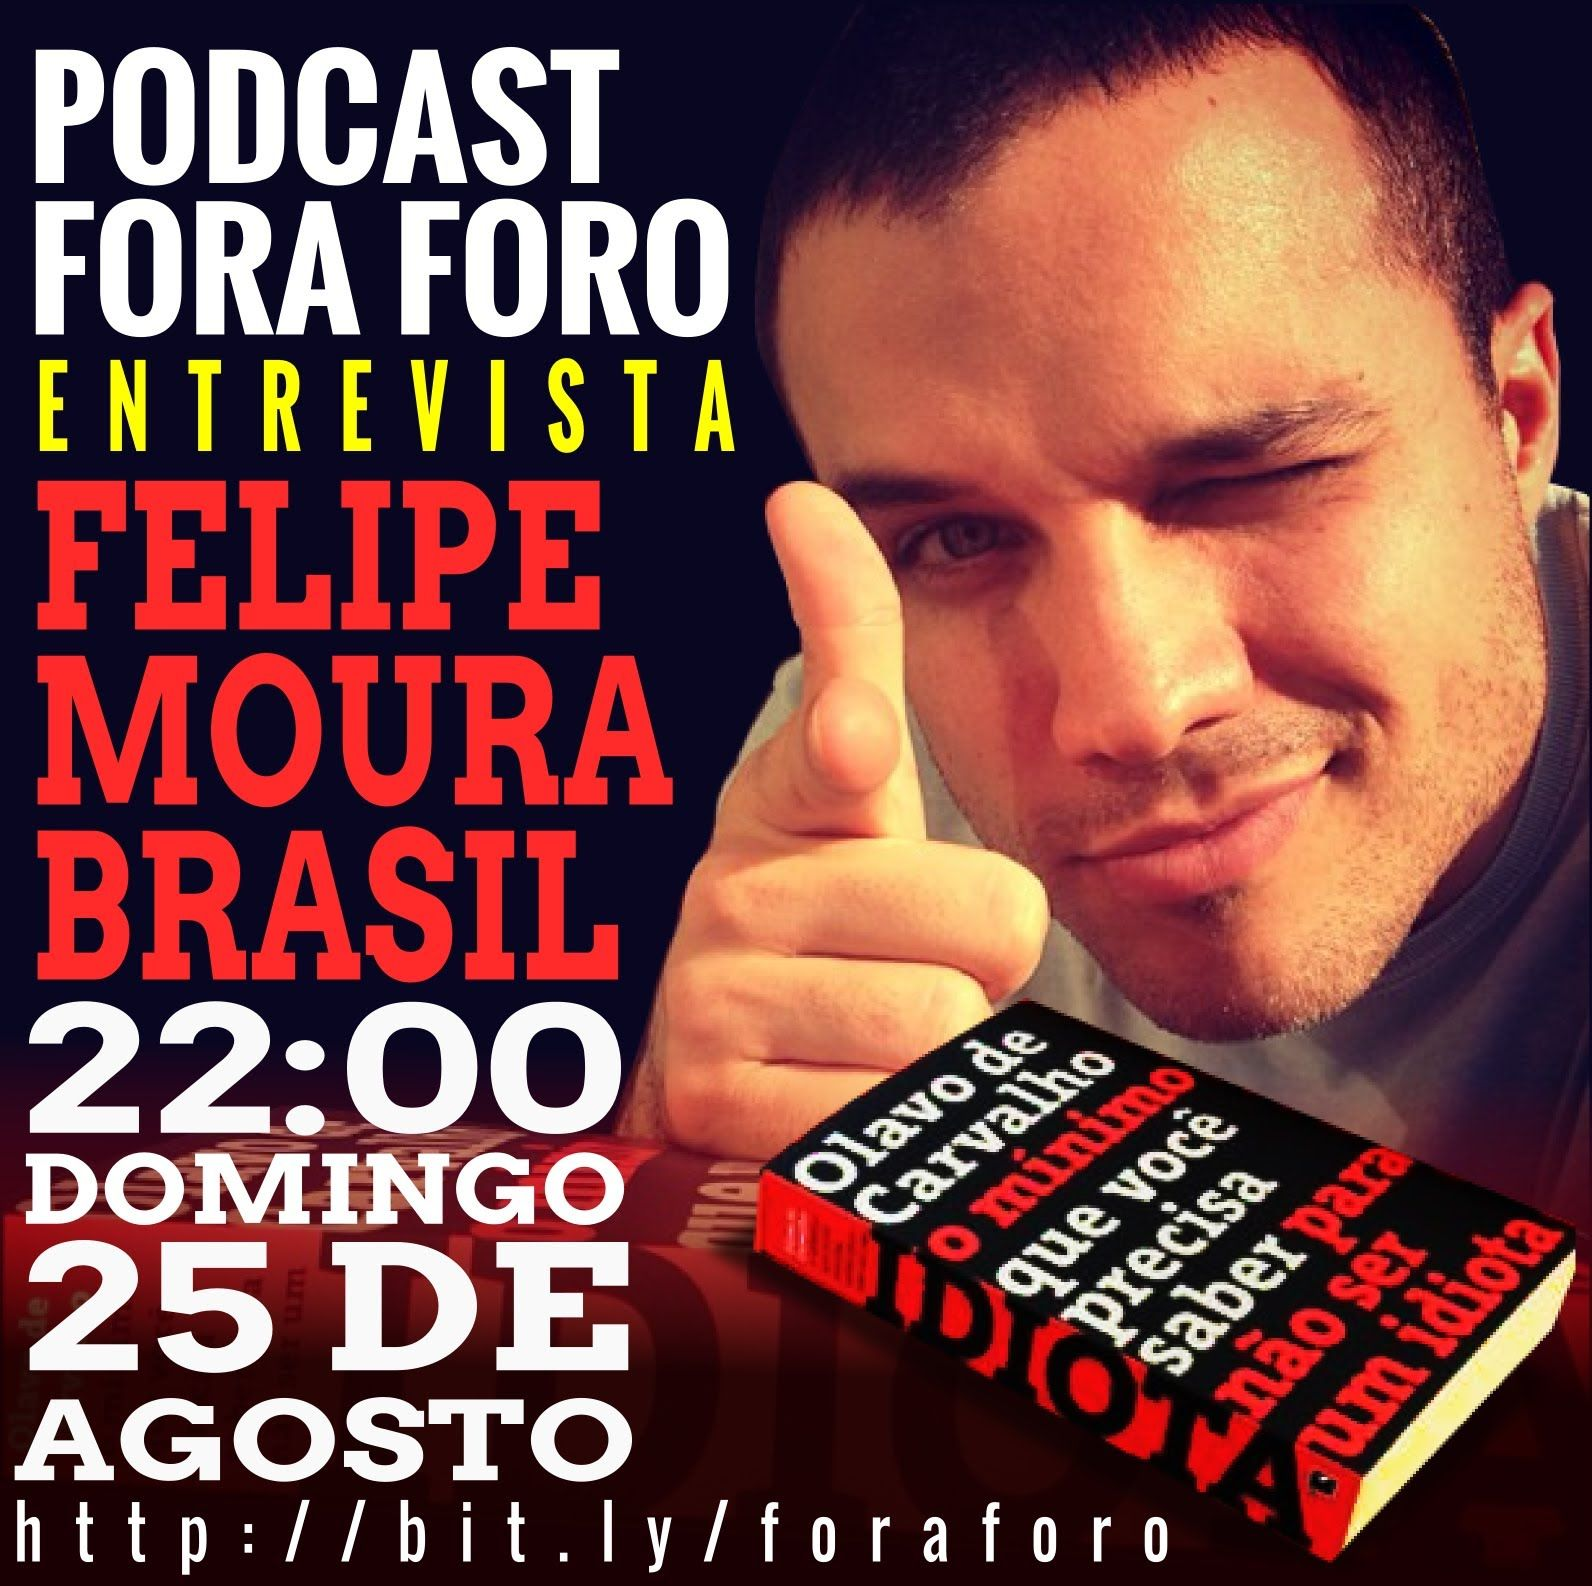 FELIPE MOURA BRASIL - PODCAST FORA FORO - 25 DE AGOSTO DE 2013